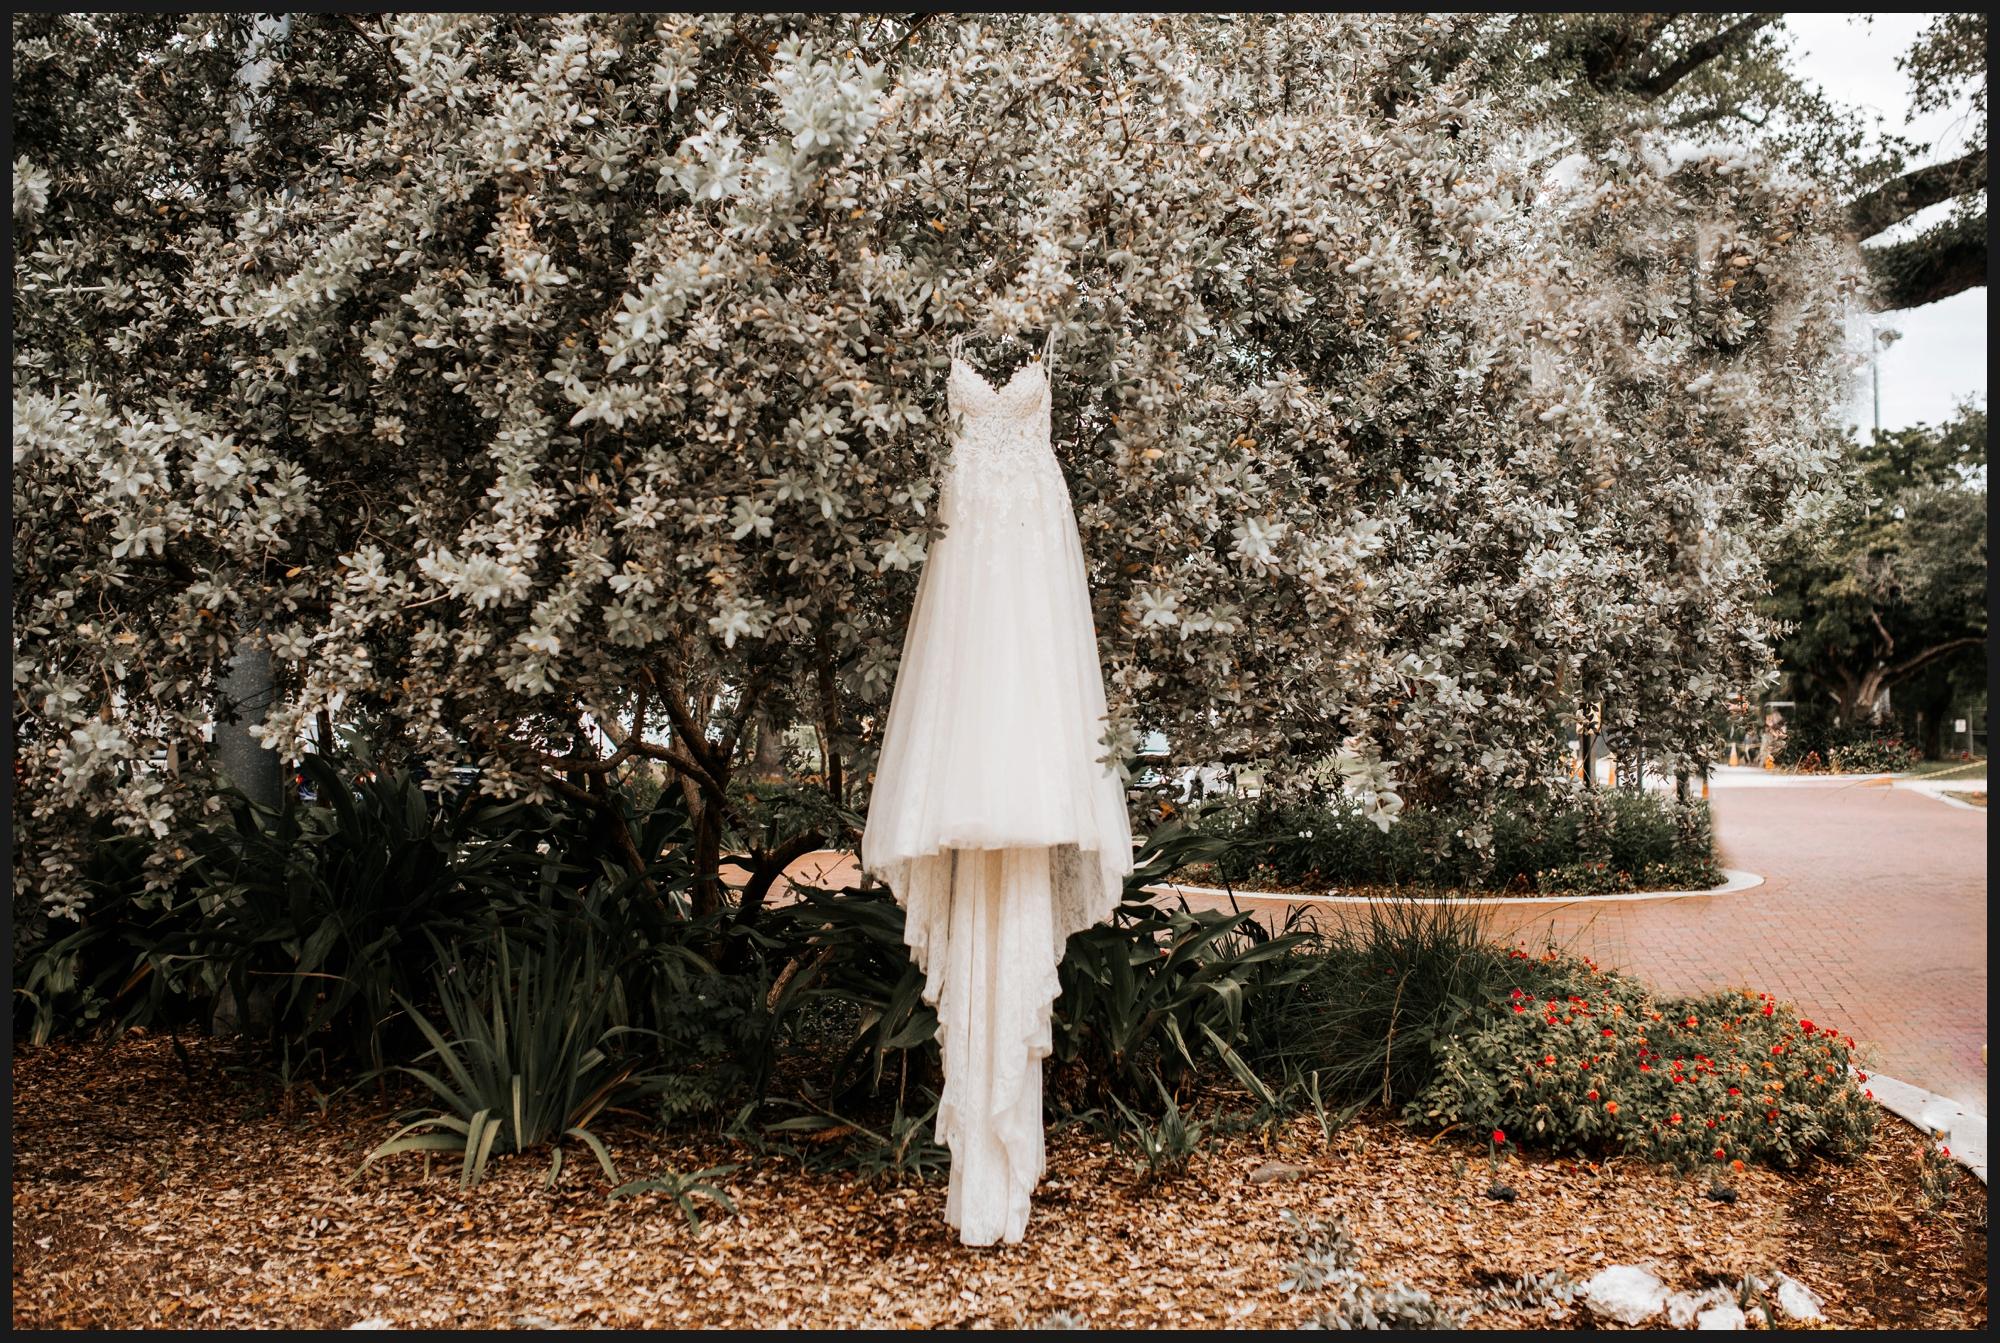 Orlando-Wedding-Photographer-destination-wedding-photographer-florida-wedding-photographer-bohemian-wedding-photographer_0023.jpg